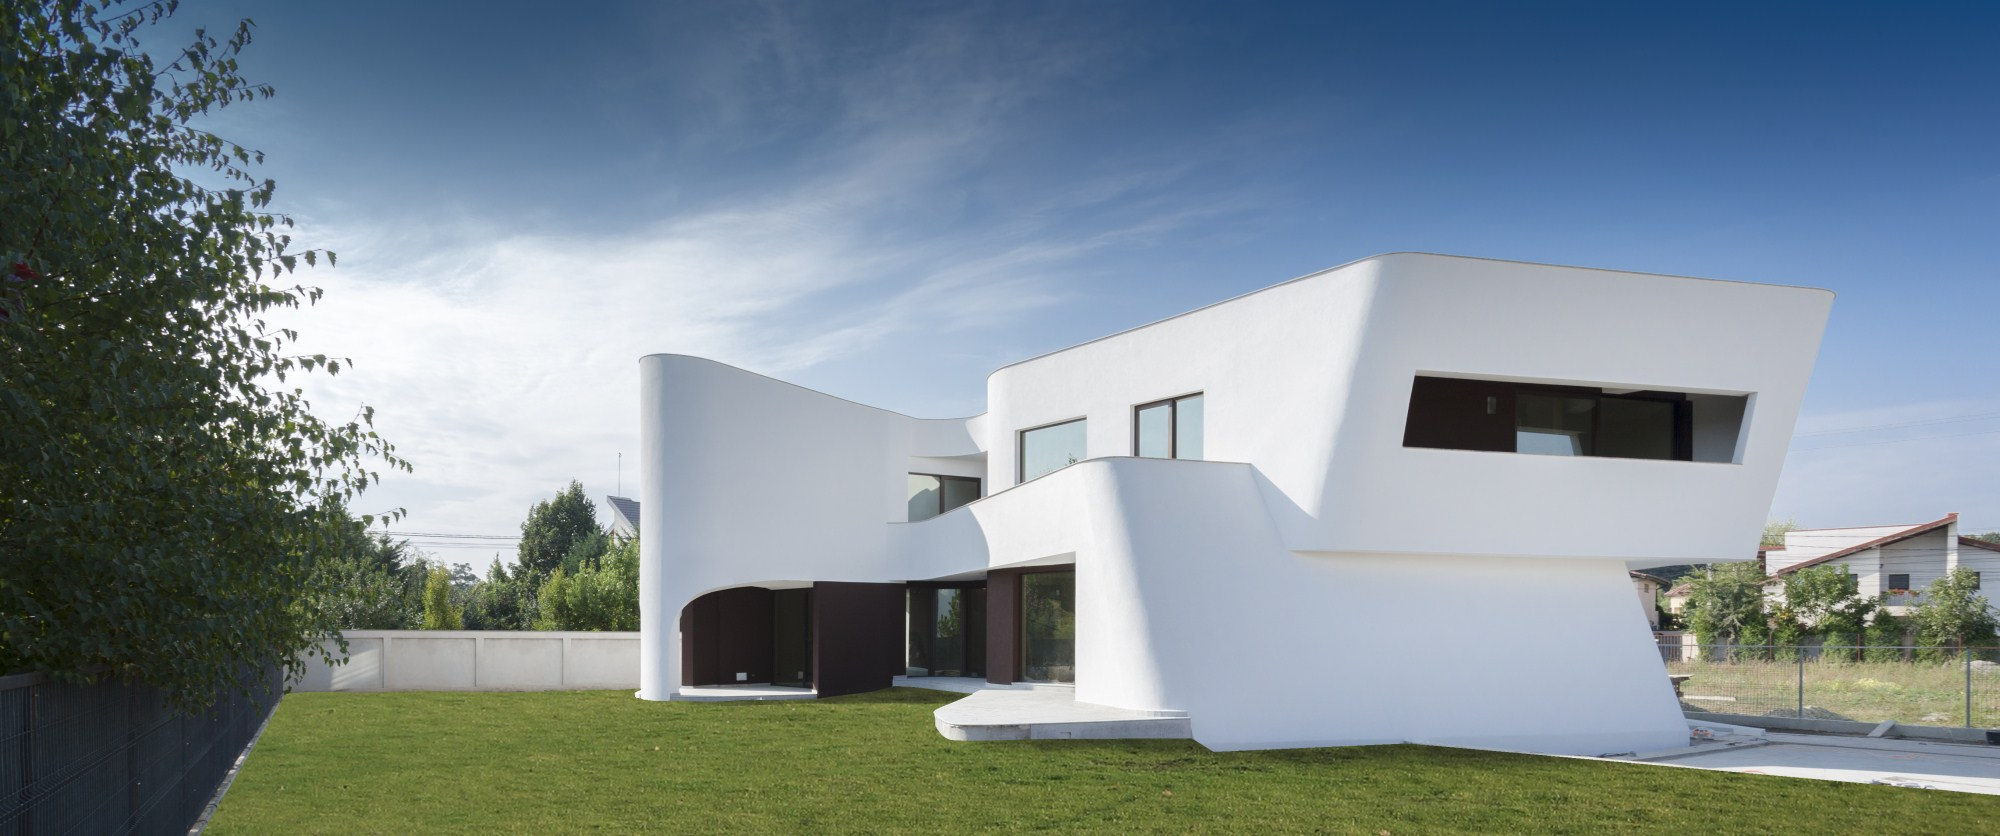 https://nbc-arhitect.ro/wp-content/uploads/2020/10/NBC-Arhitect-_-residences-_-Wing-House-_-Romania-_-exterior-view_4.jpg